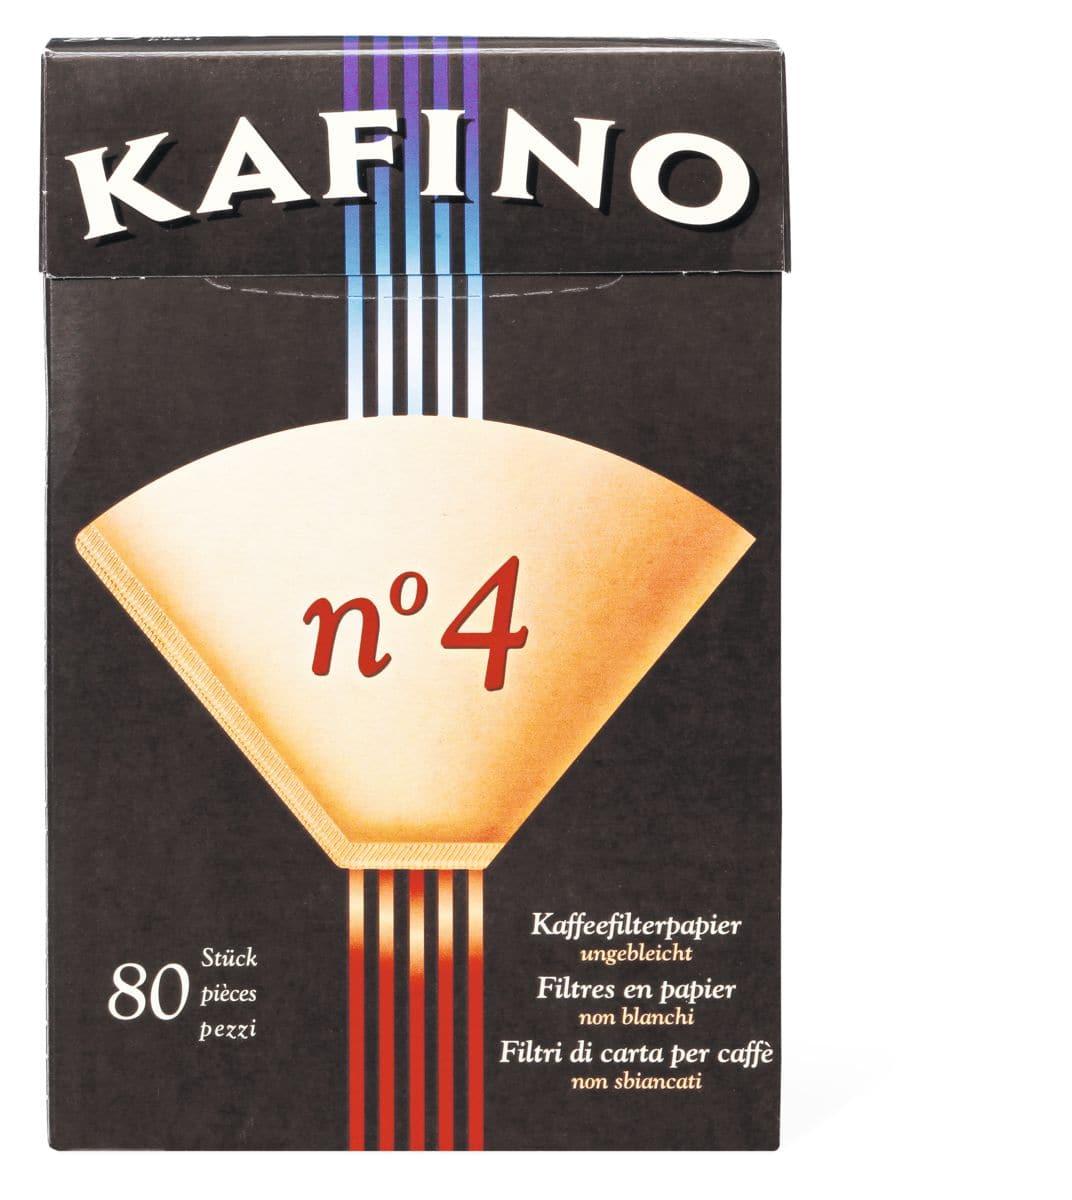 Kafino Kafino n°4 Filtri Carta caffè